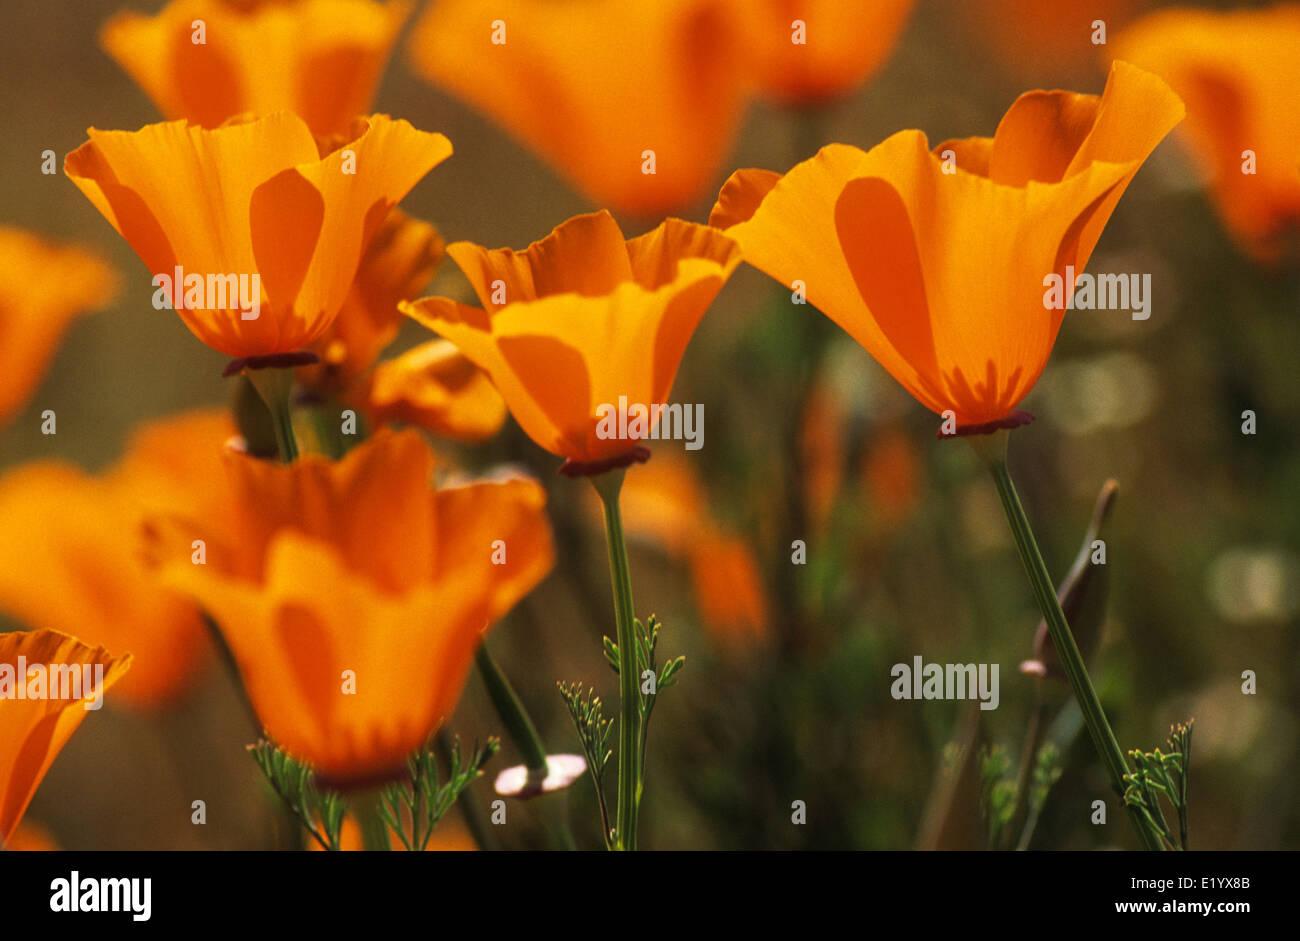 Elk248-3095 California, Antelope Valley California Poppy Preserve, California poppies - Stock Image